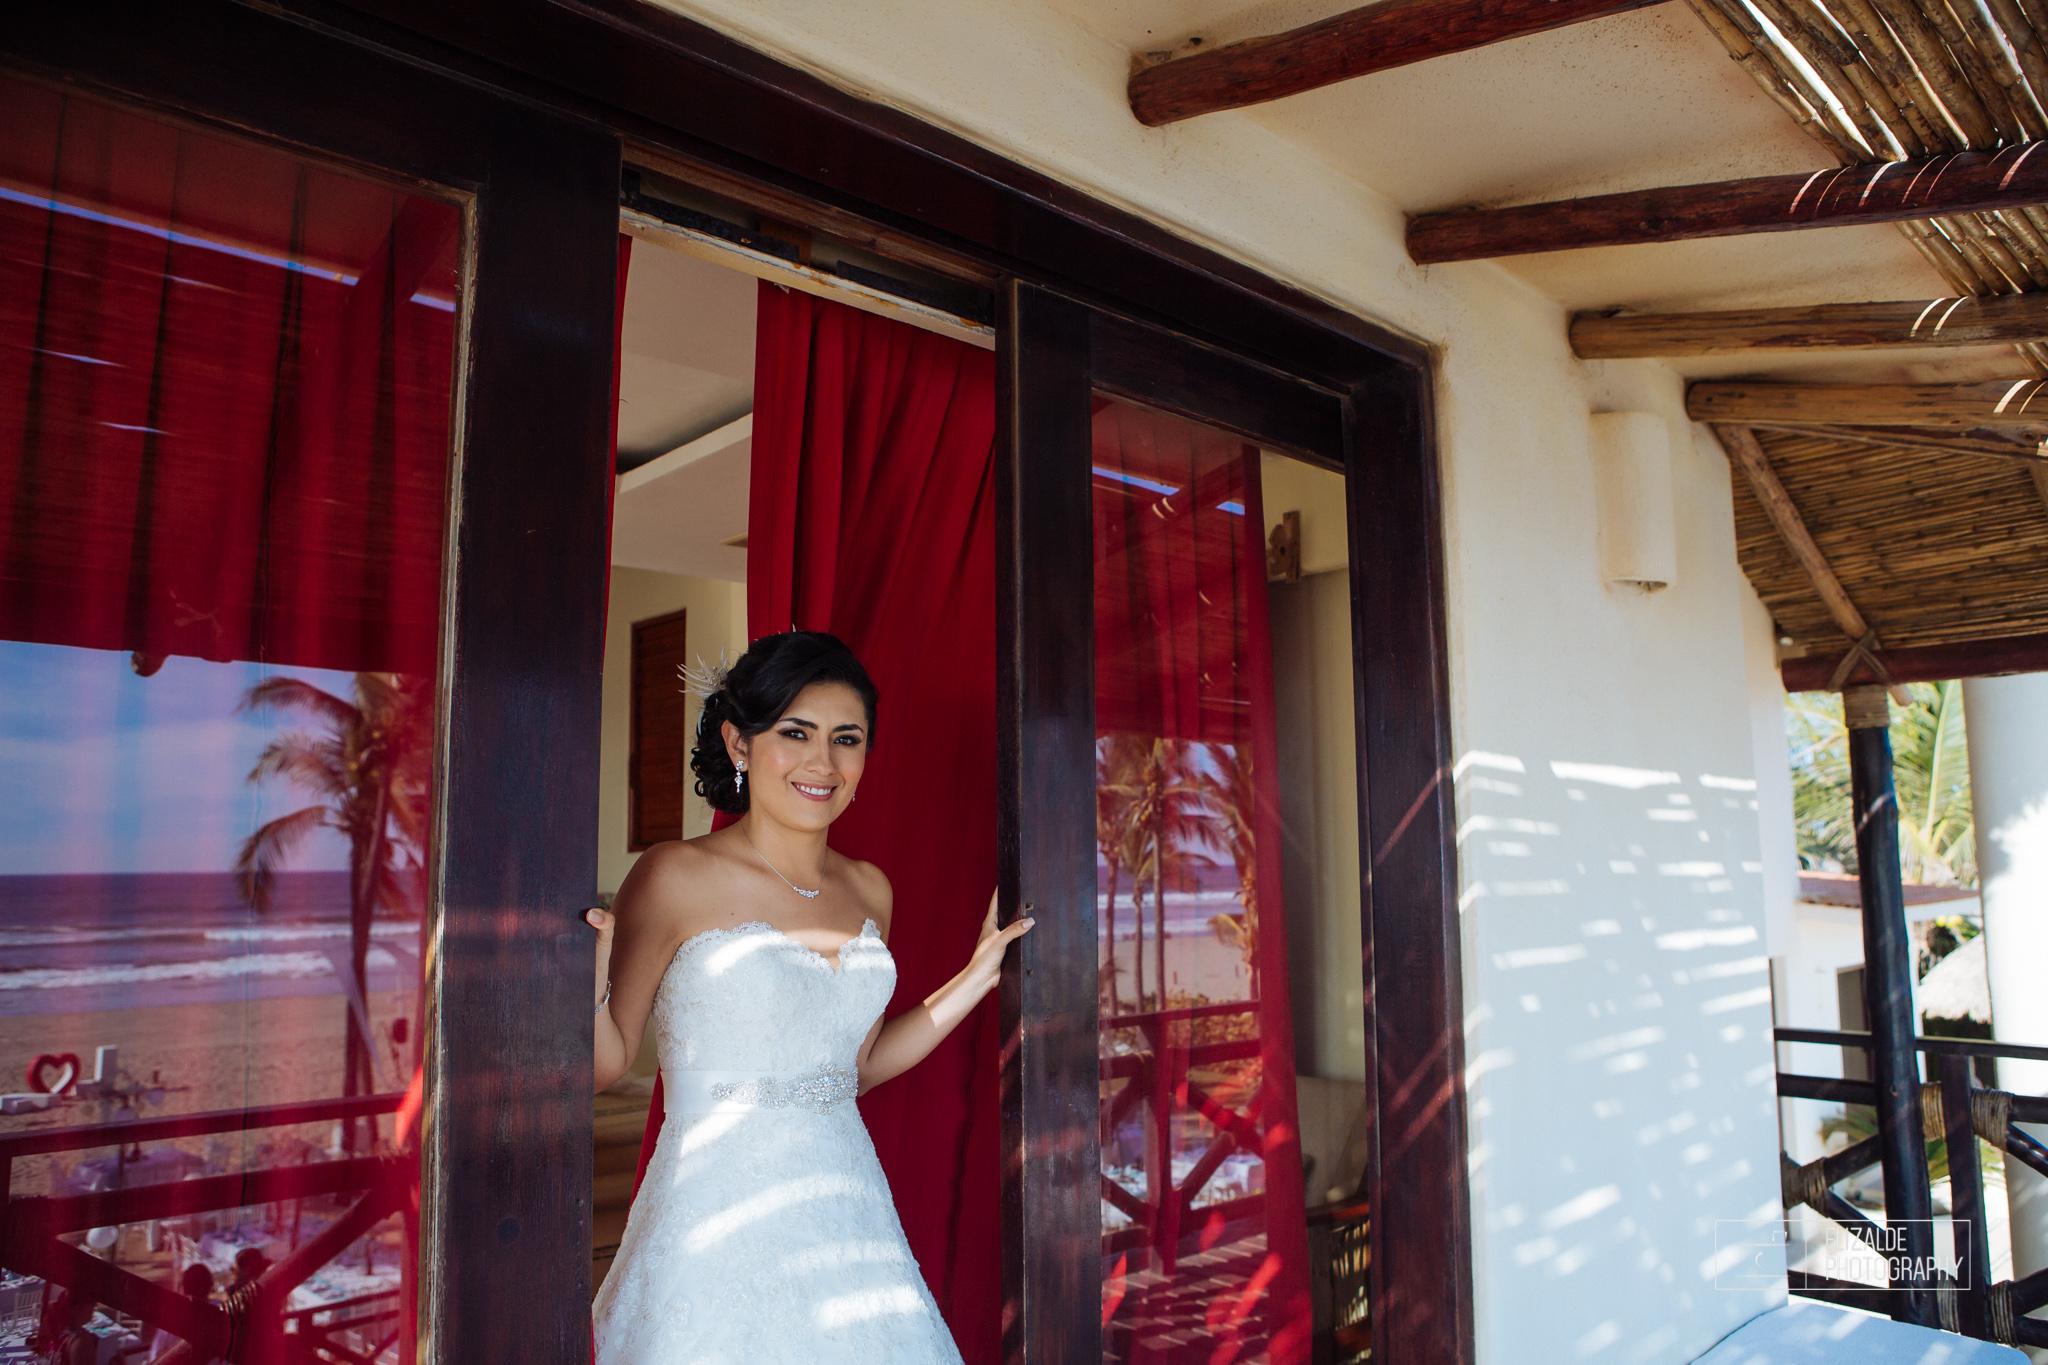 Pay and Ferran_Acapulco_Destination Wedding_Elizalde Photography-45.jpg